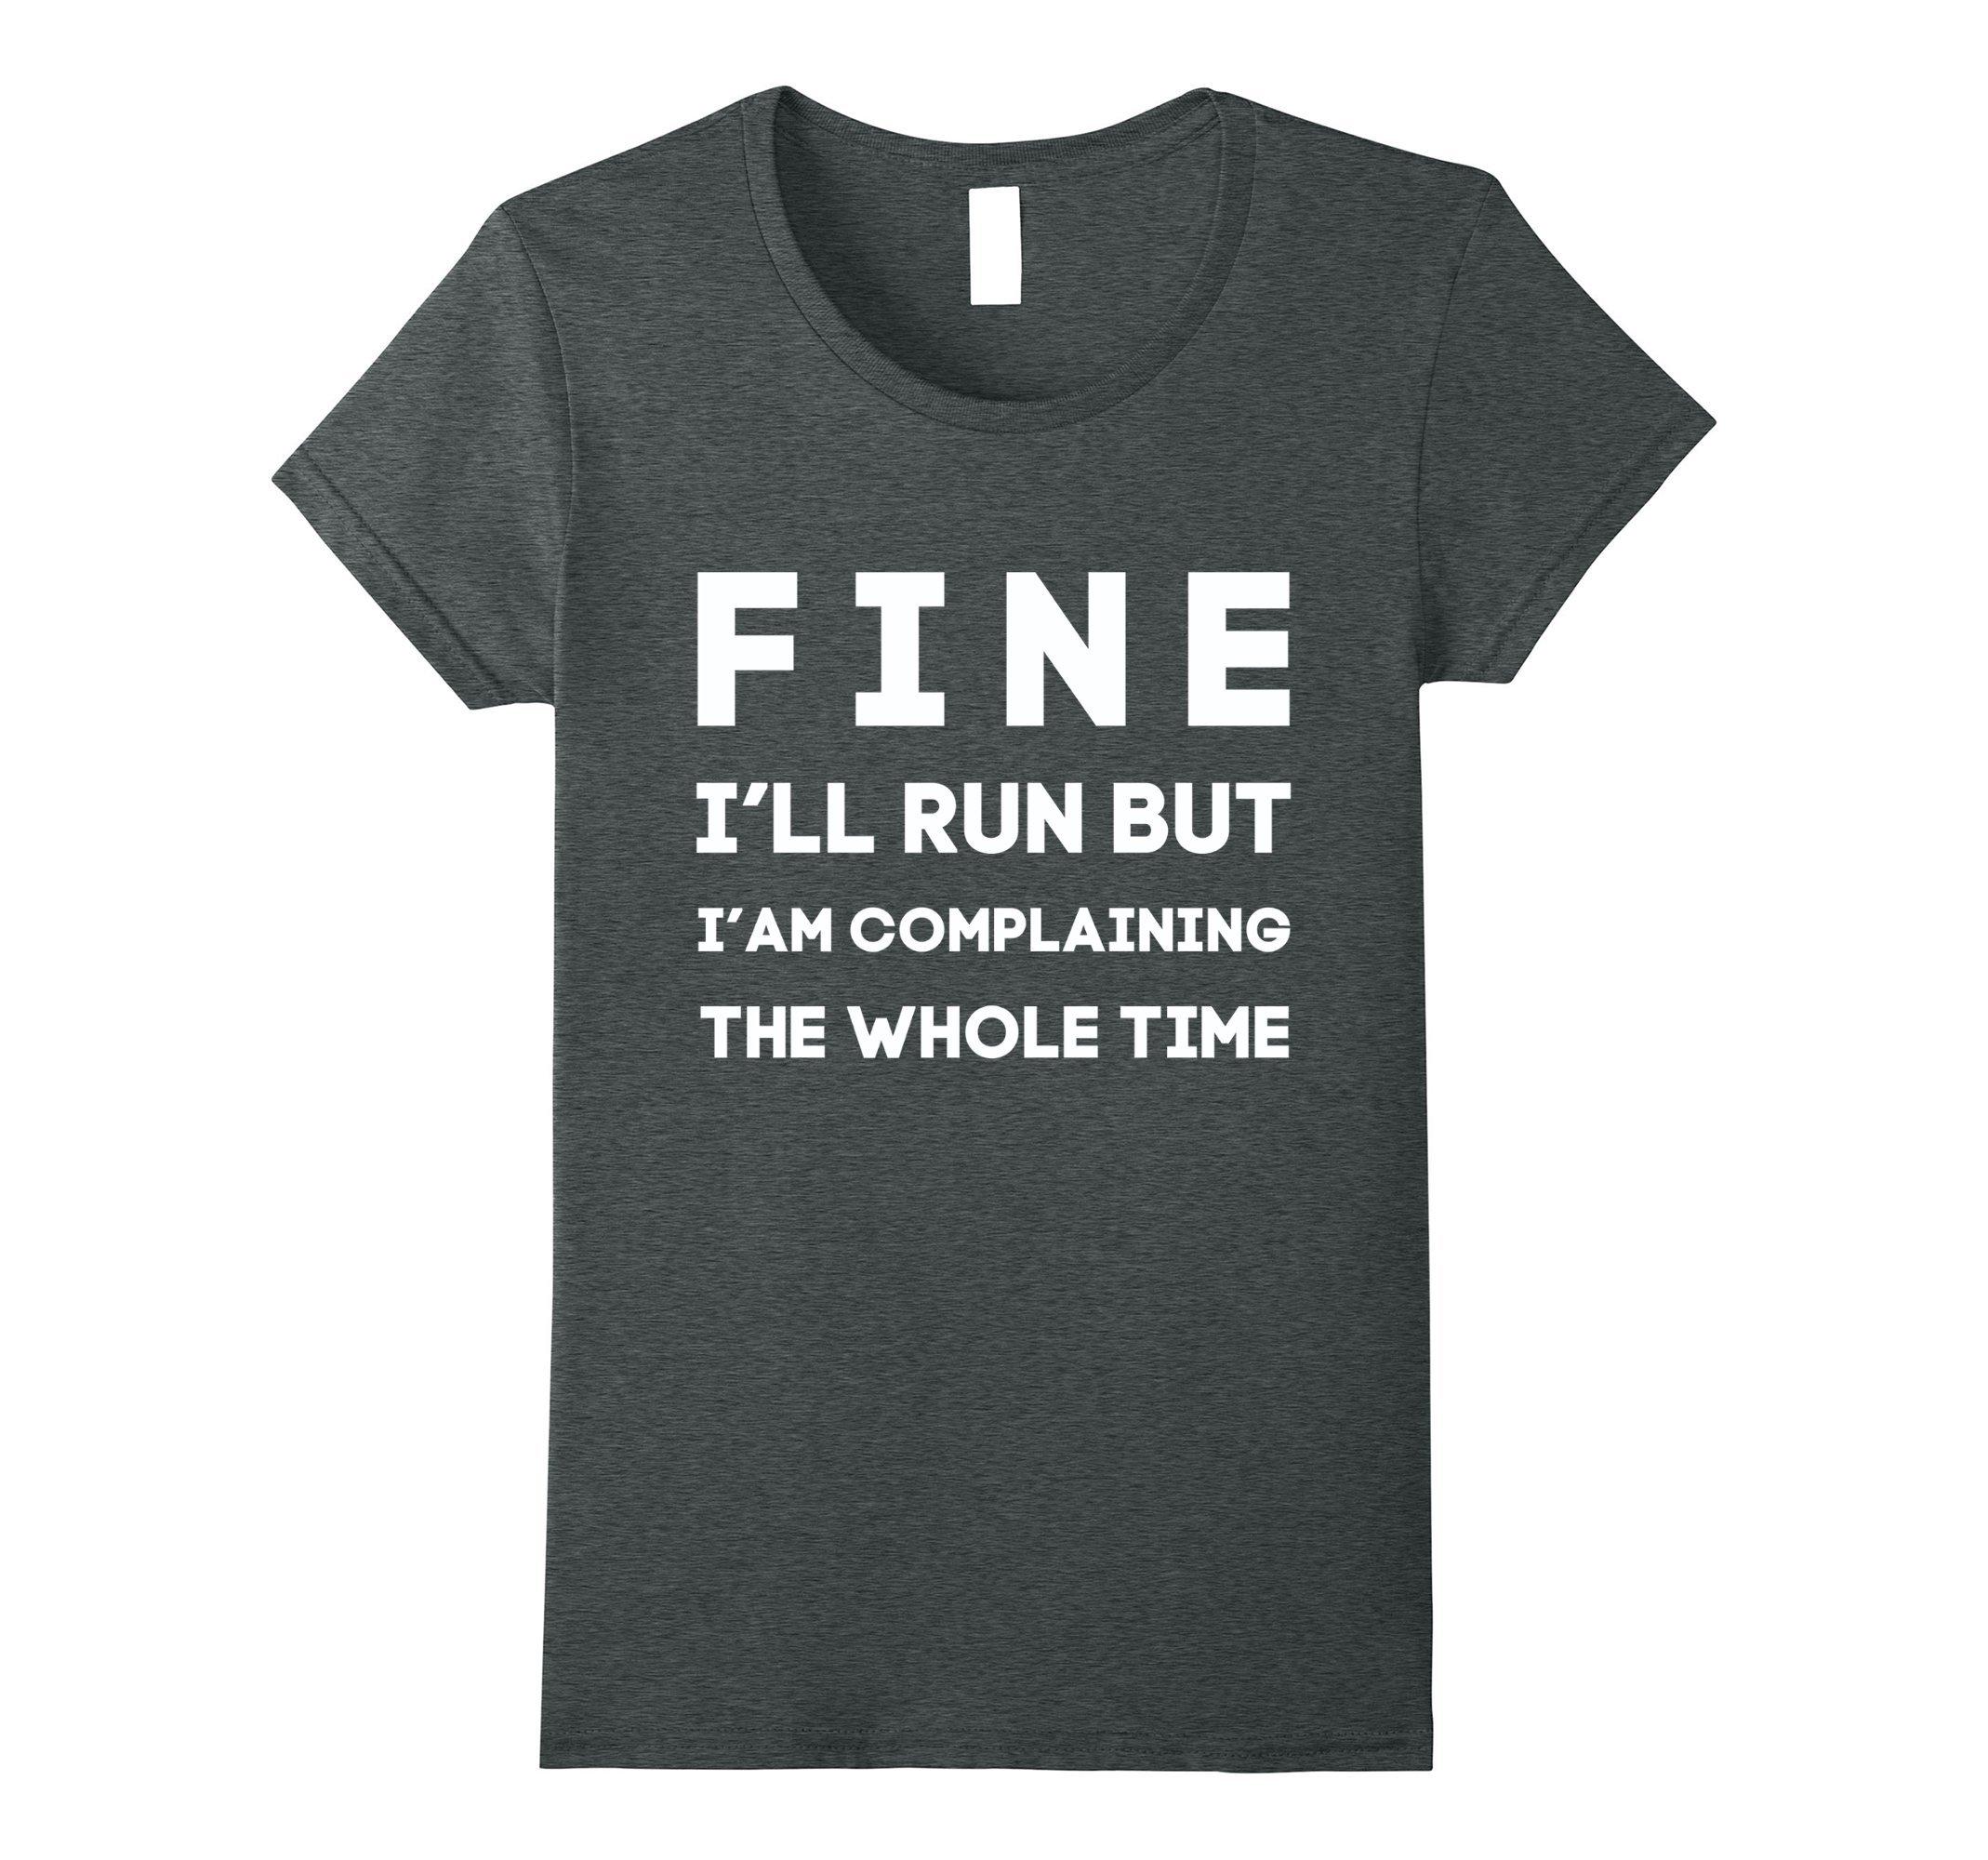 Womens Ok Fine I'll Run But I'm Going To Complain Funny T-Shirt Medium Dark Heather by Fun TShirts (Image #1)